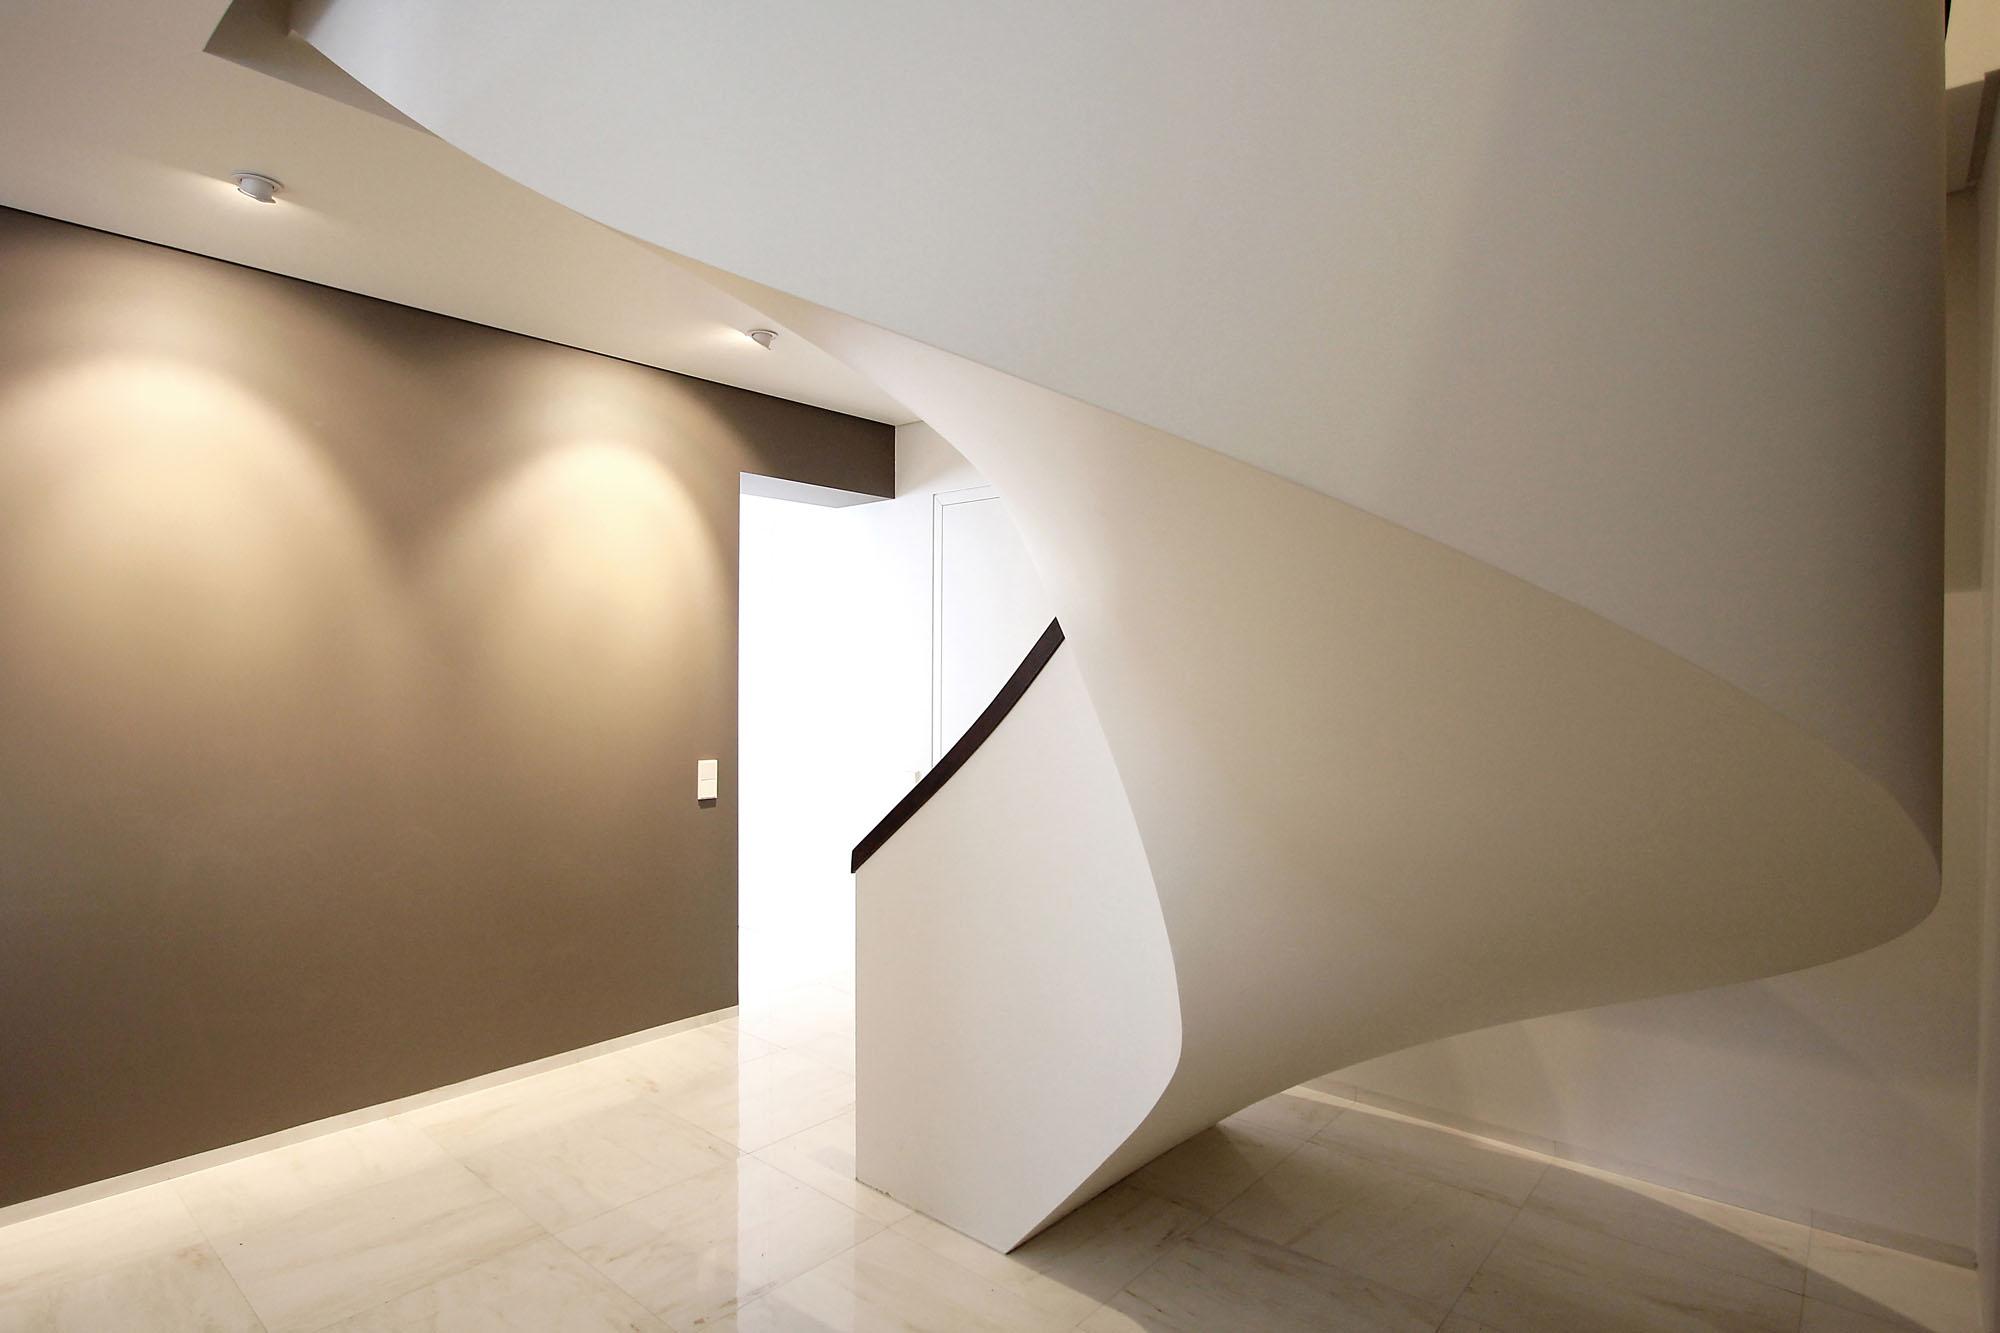 Minimal Style and White Colour Theme of House 02 by Ramunas Manikas-11